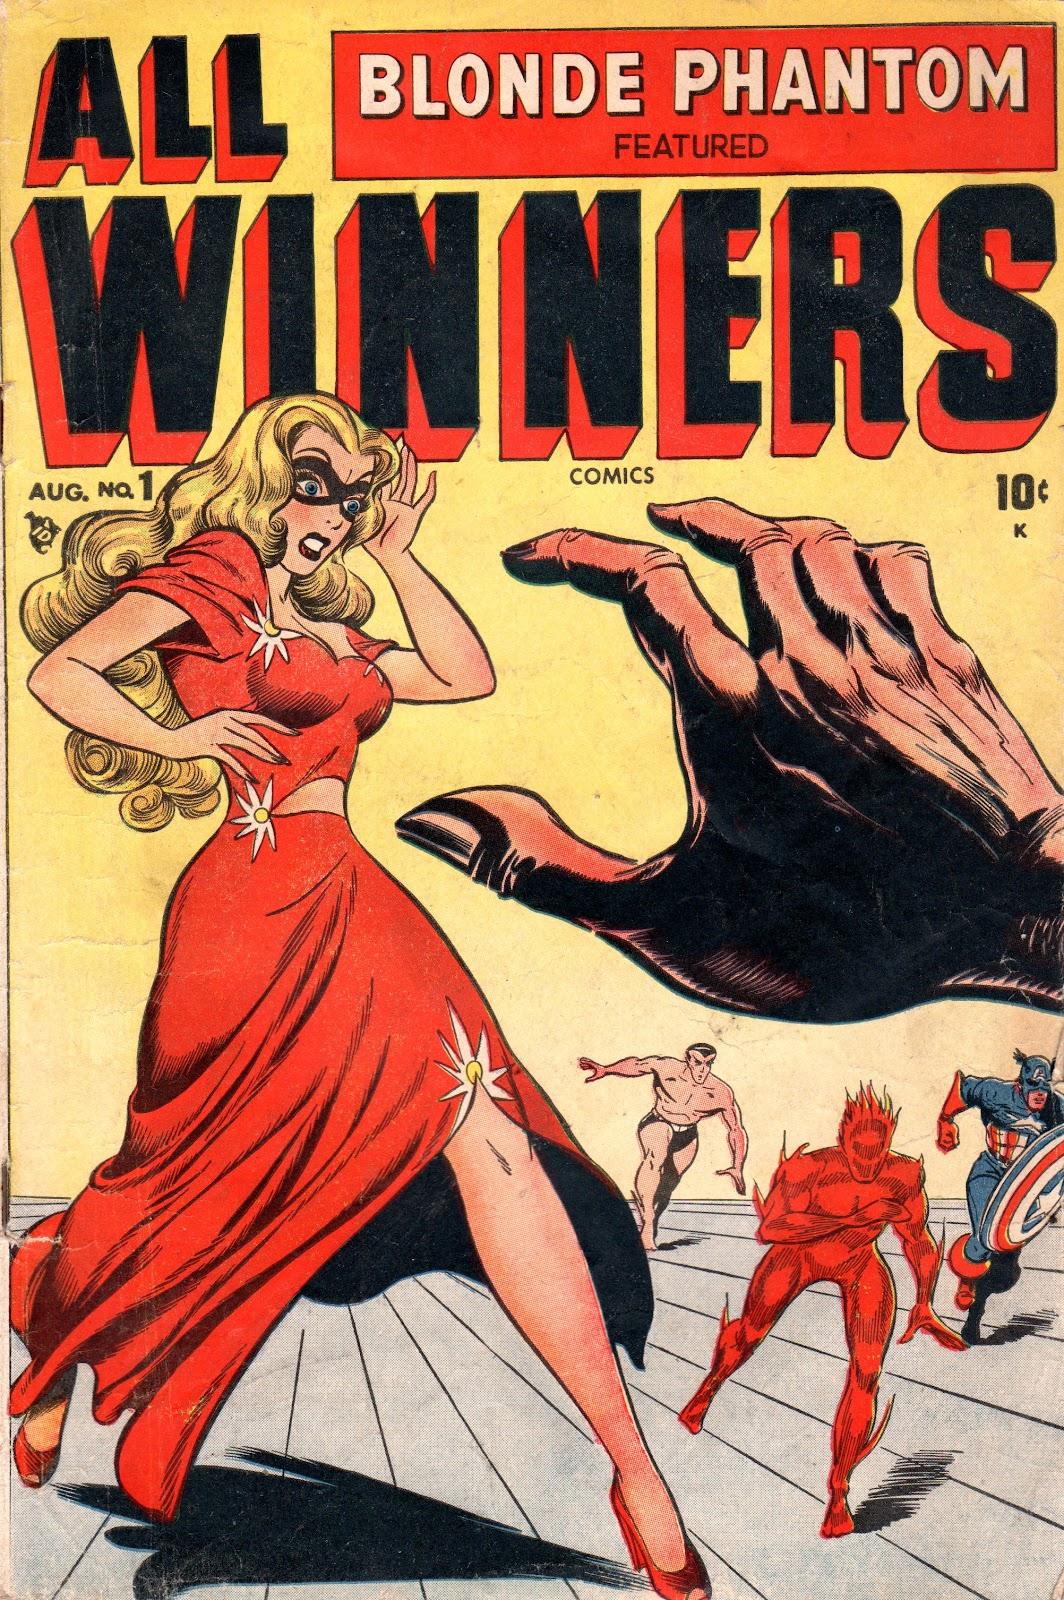 All-Winners Comics (1948) Full Page 1